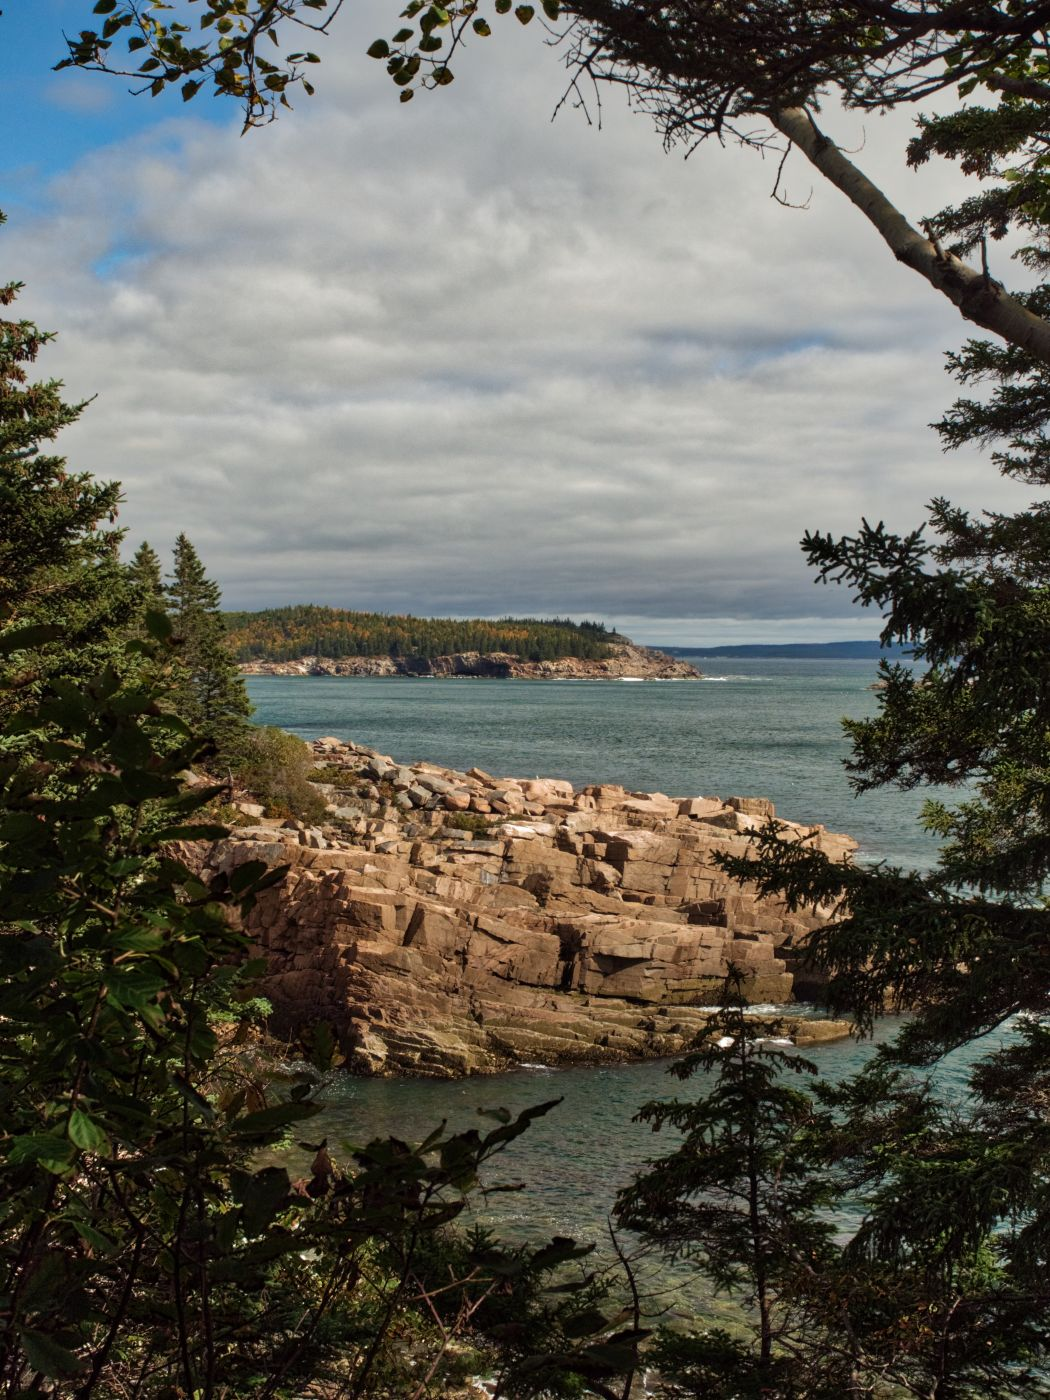 Newport Cove, Maine, USA